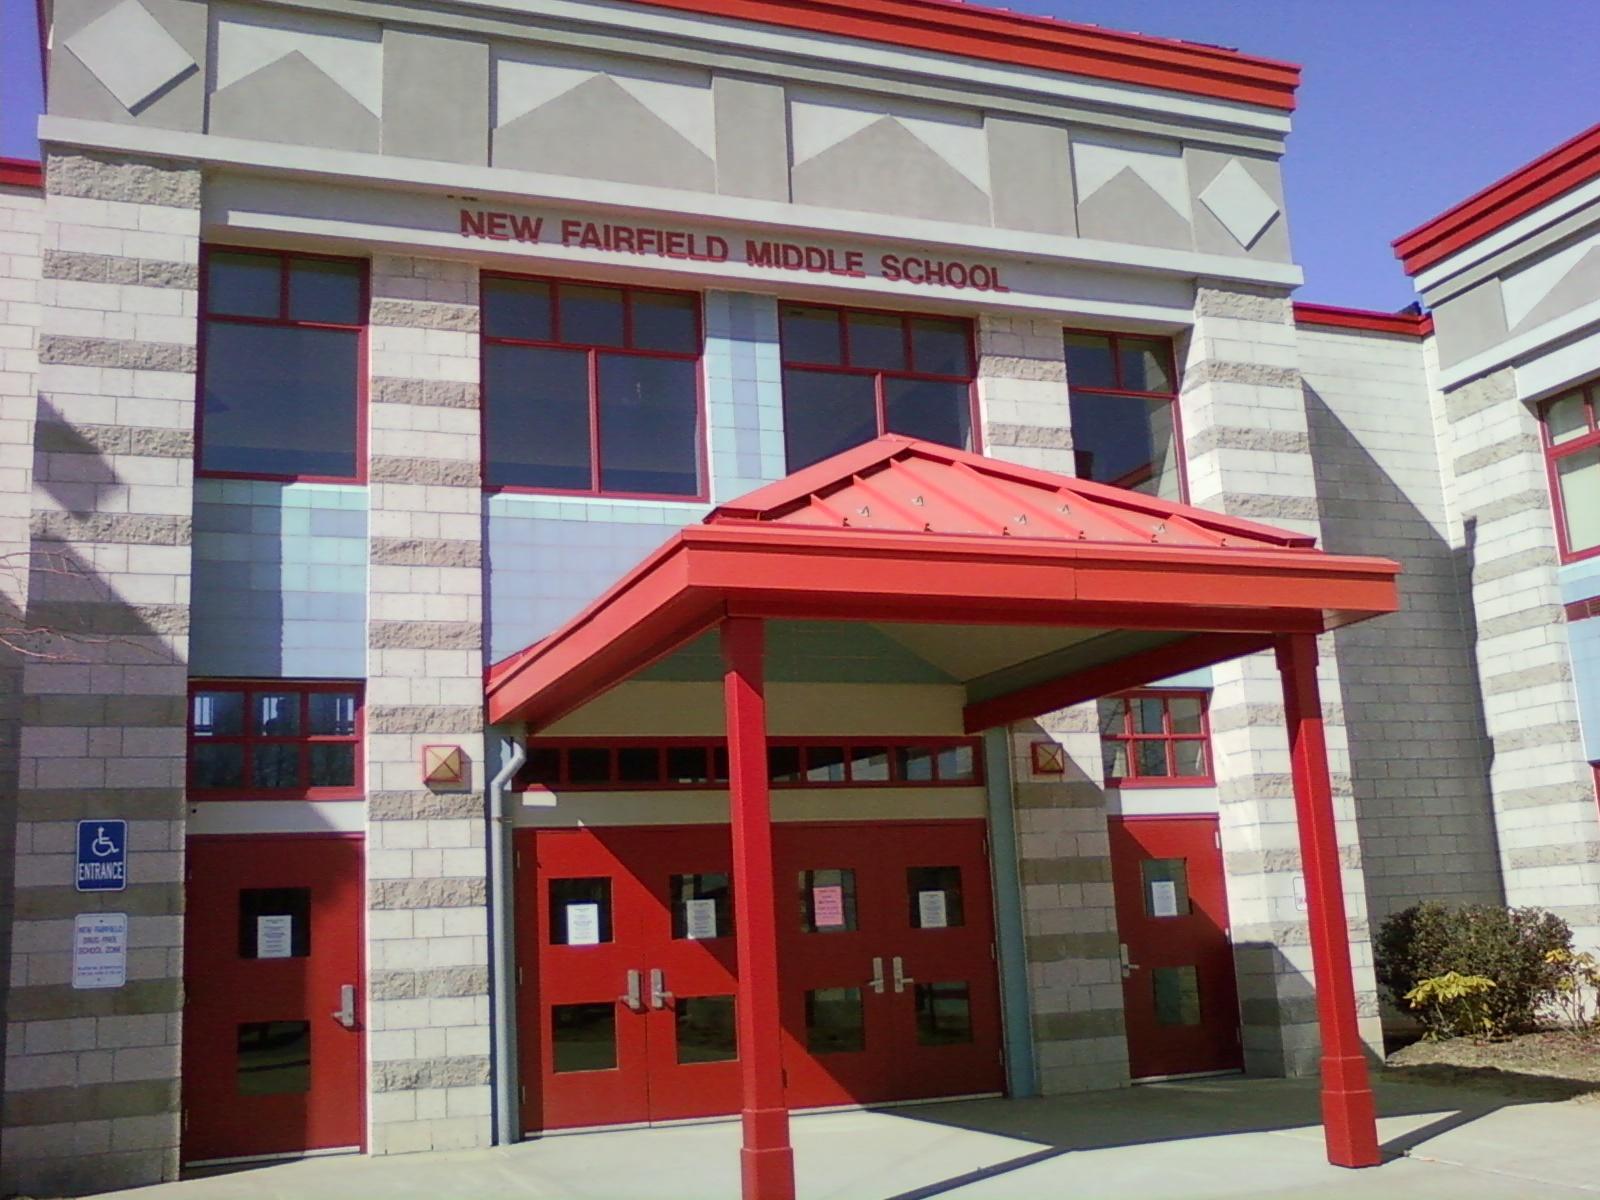 New Fairfield Schools « Diana's Neighborhood